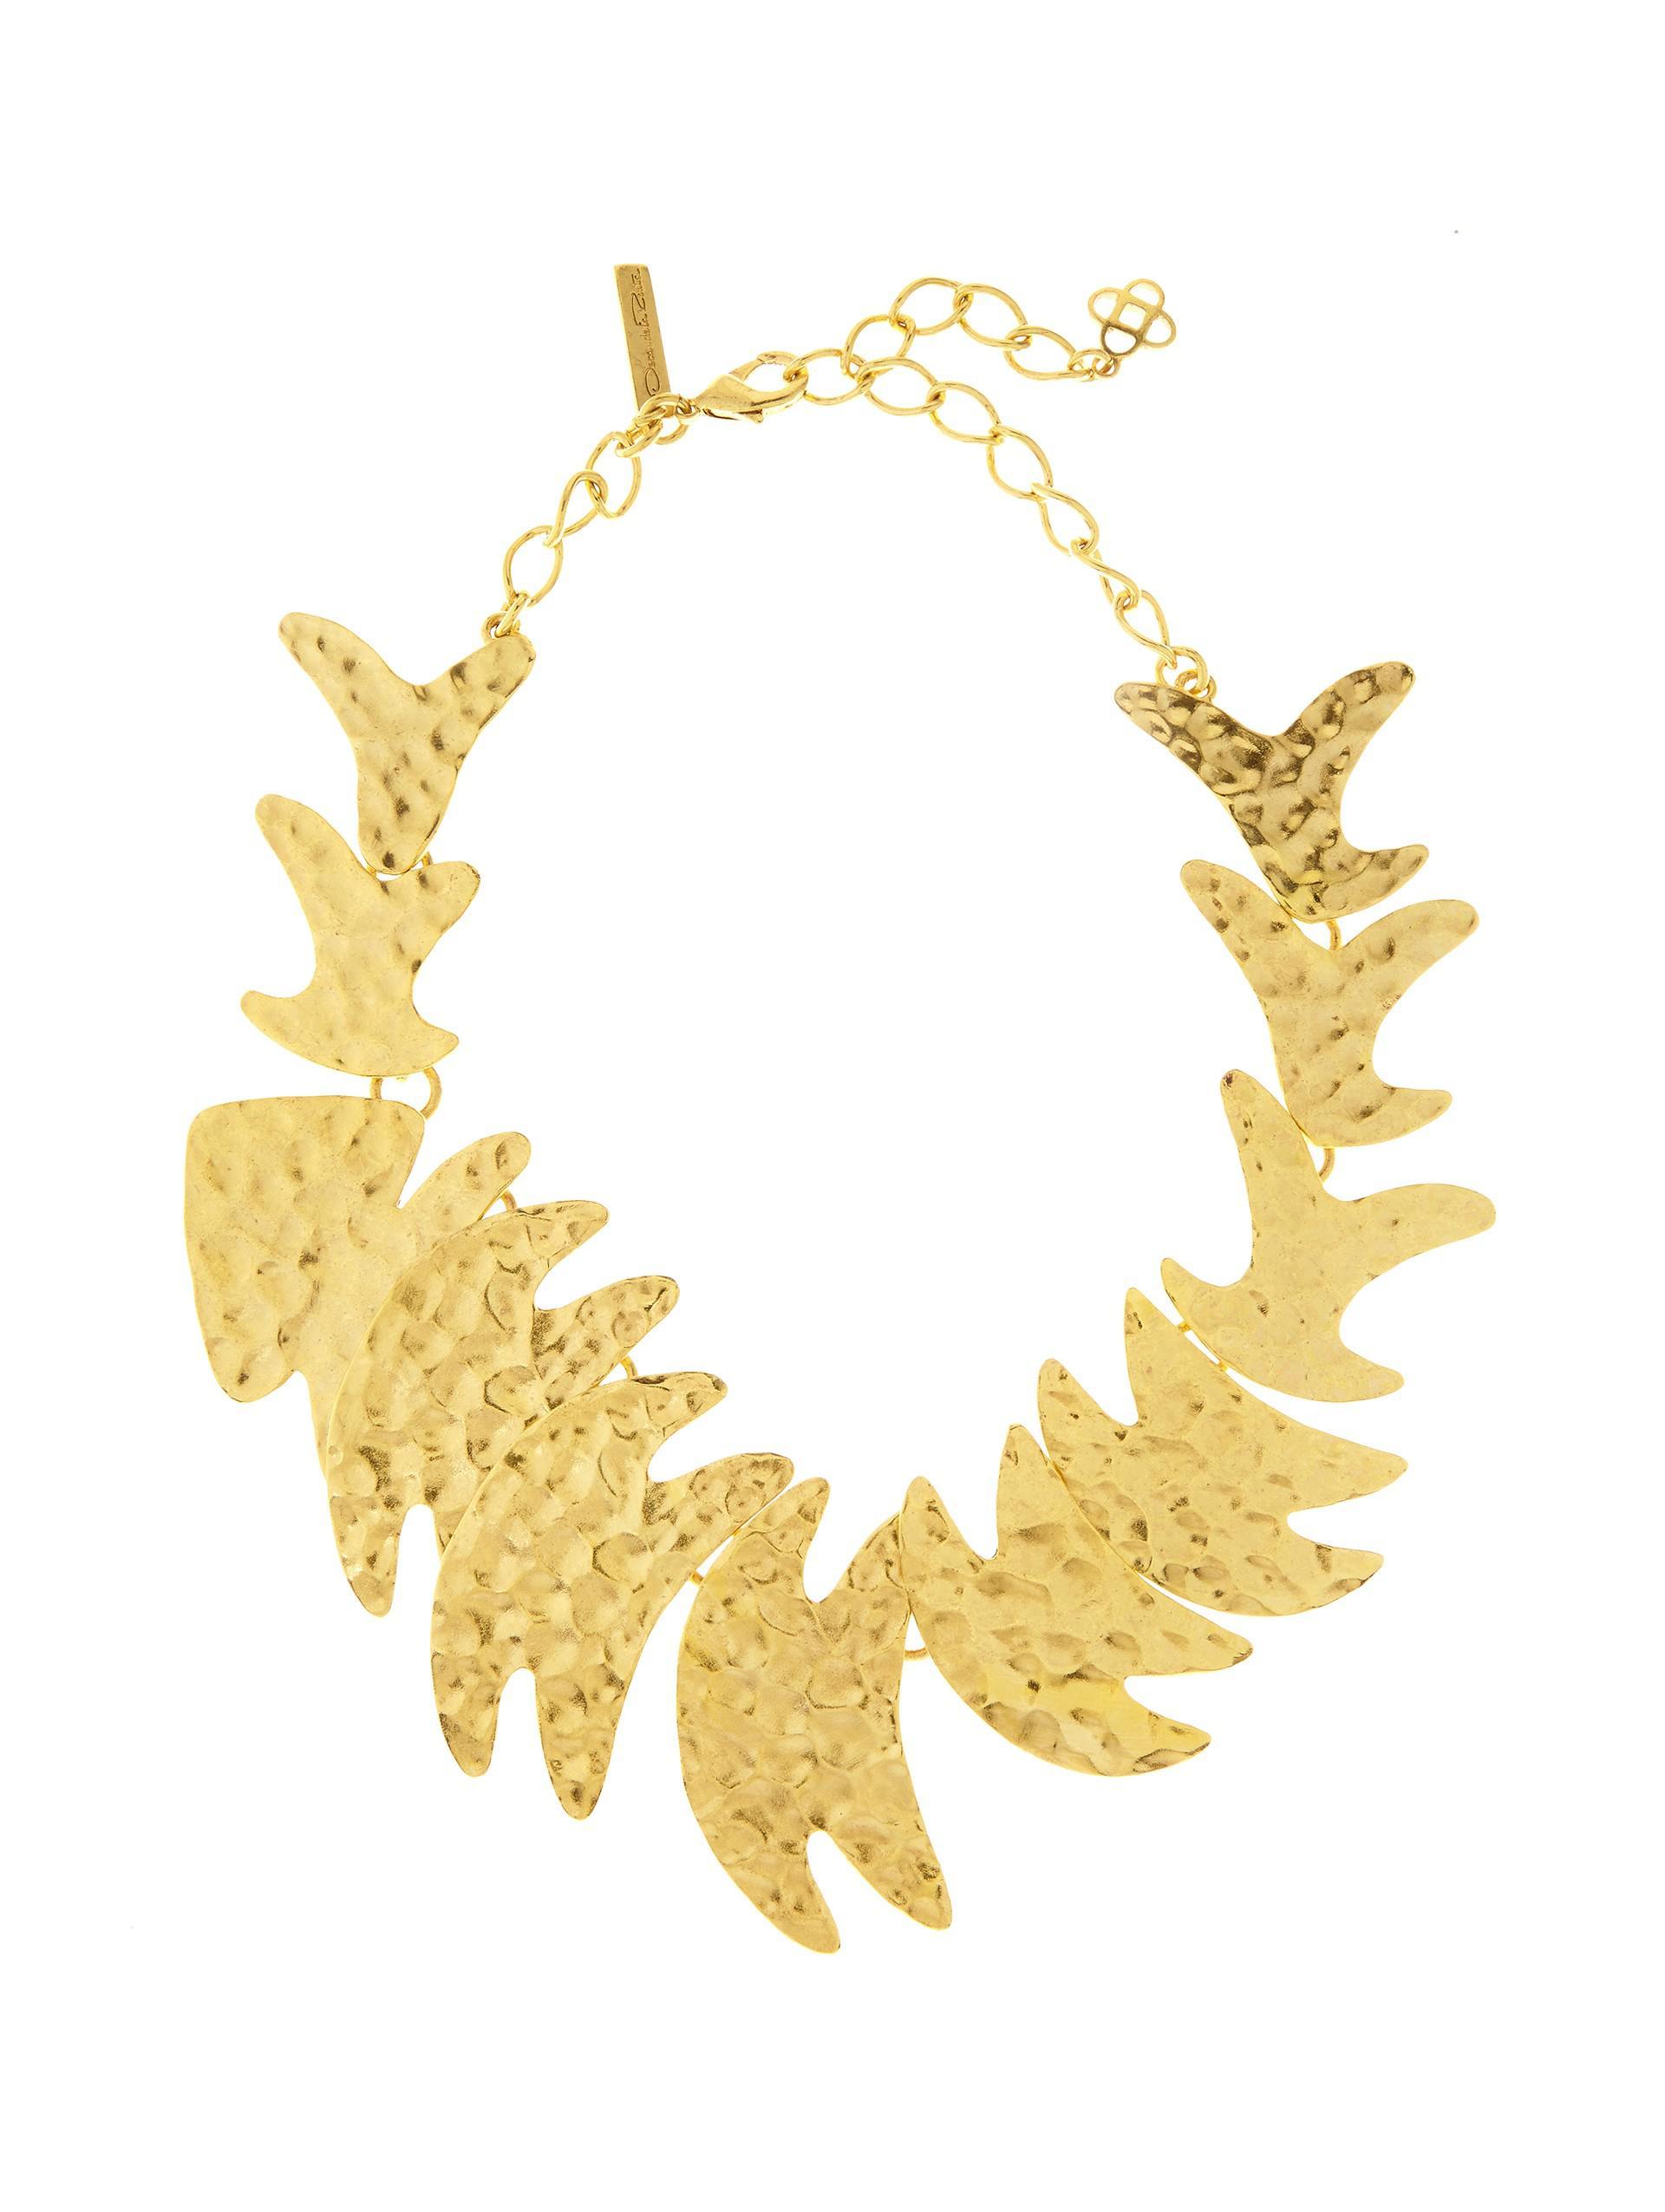 hammered fish necklace - Metallic Oscar De La Renta GKs2KFXx0